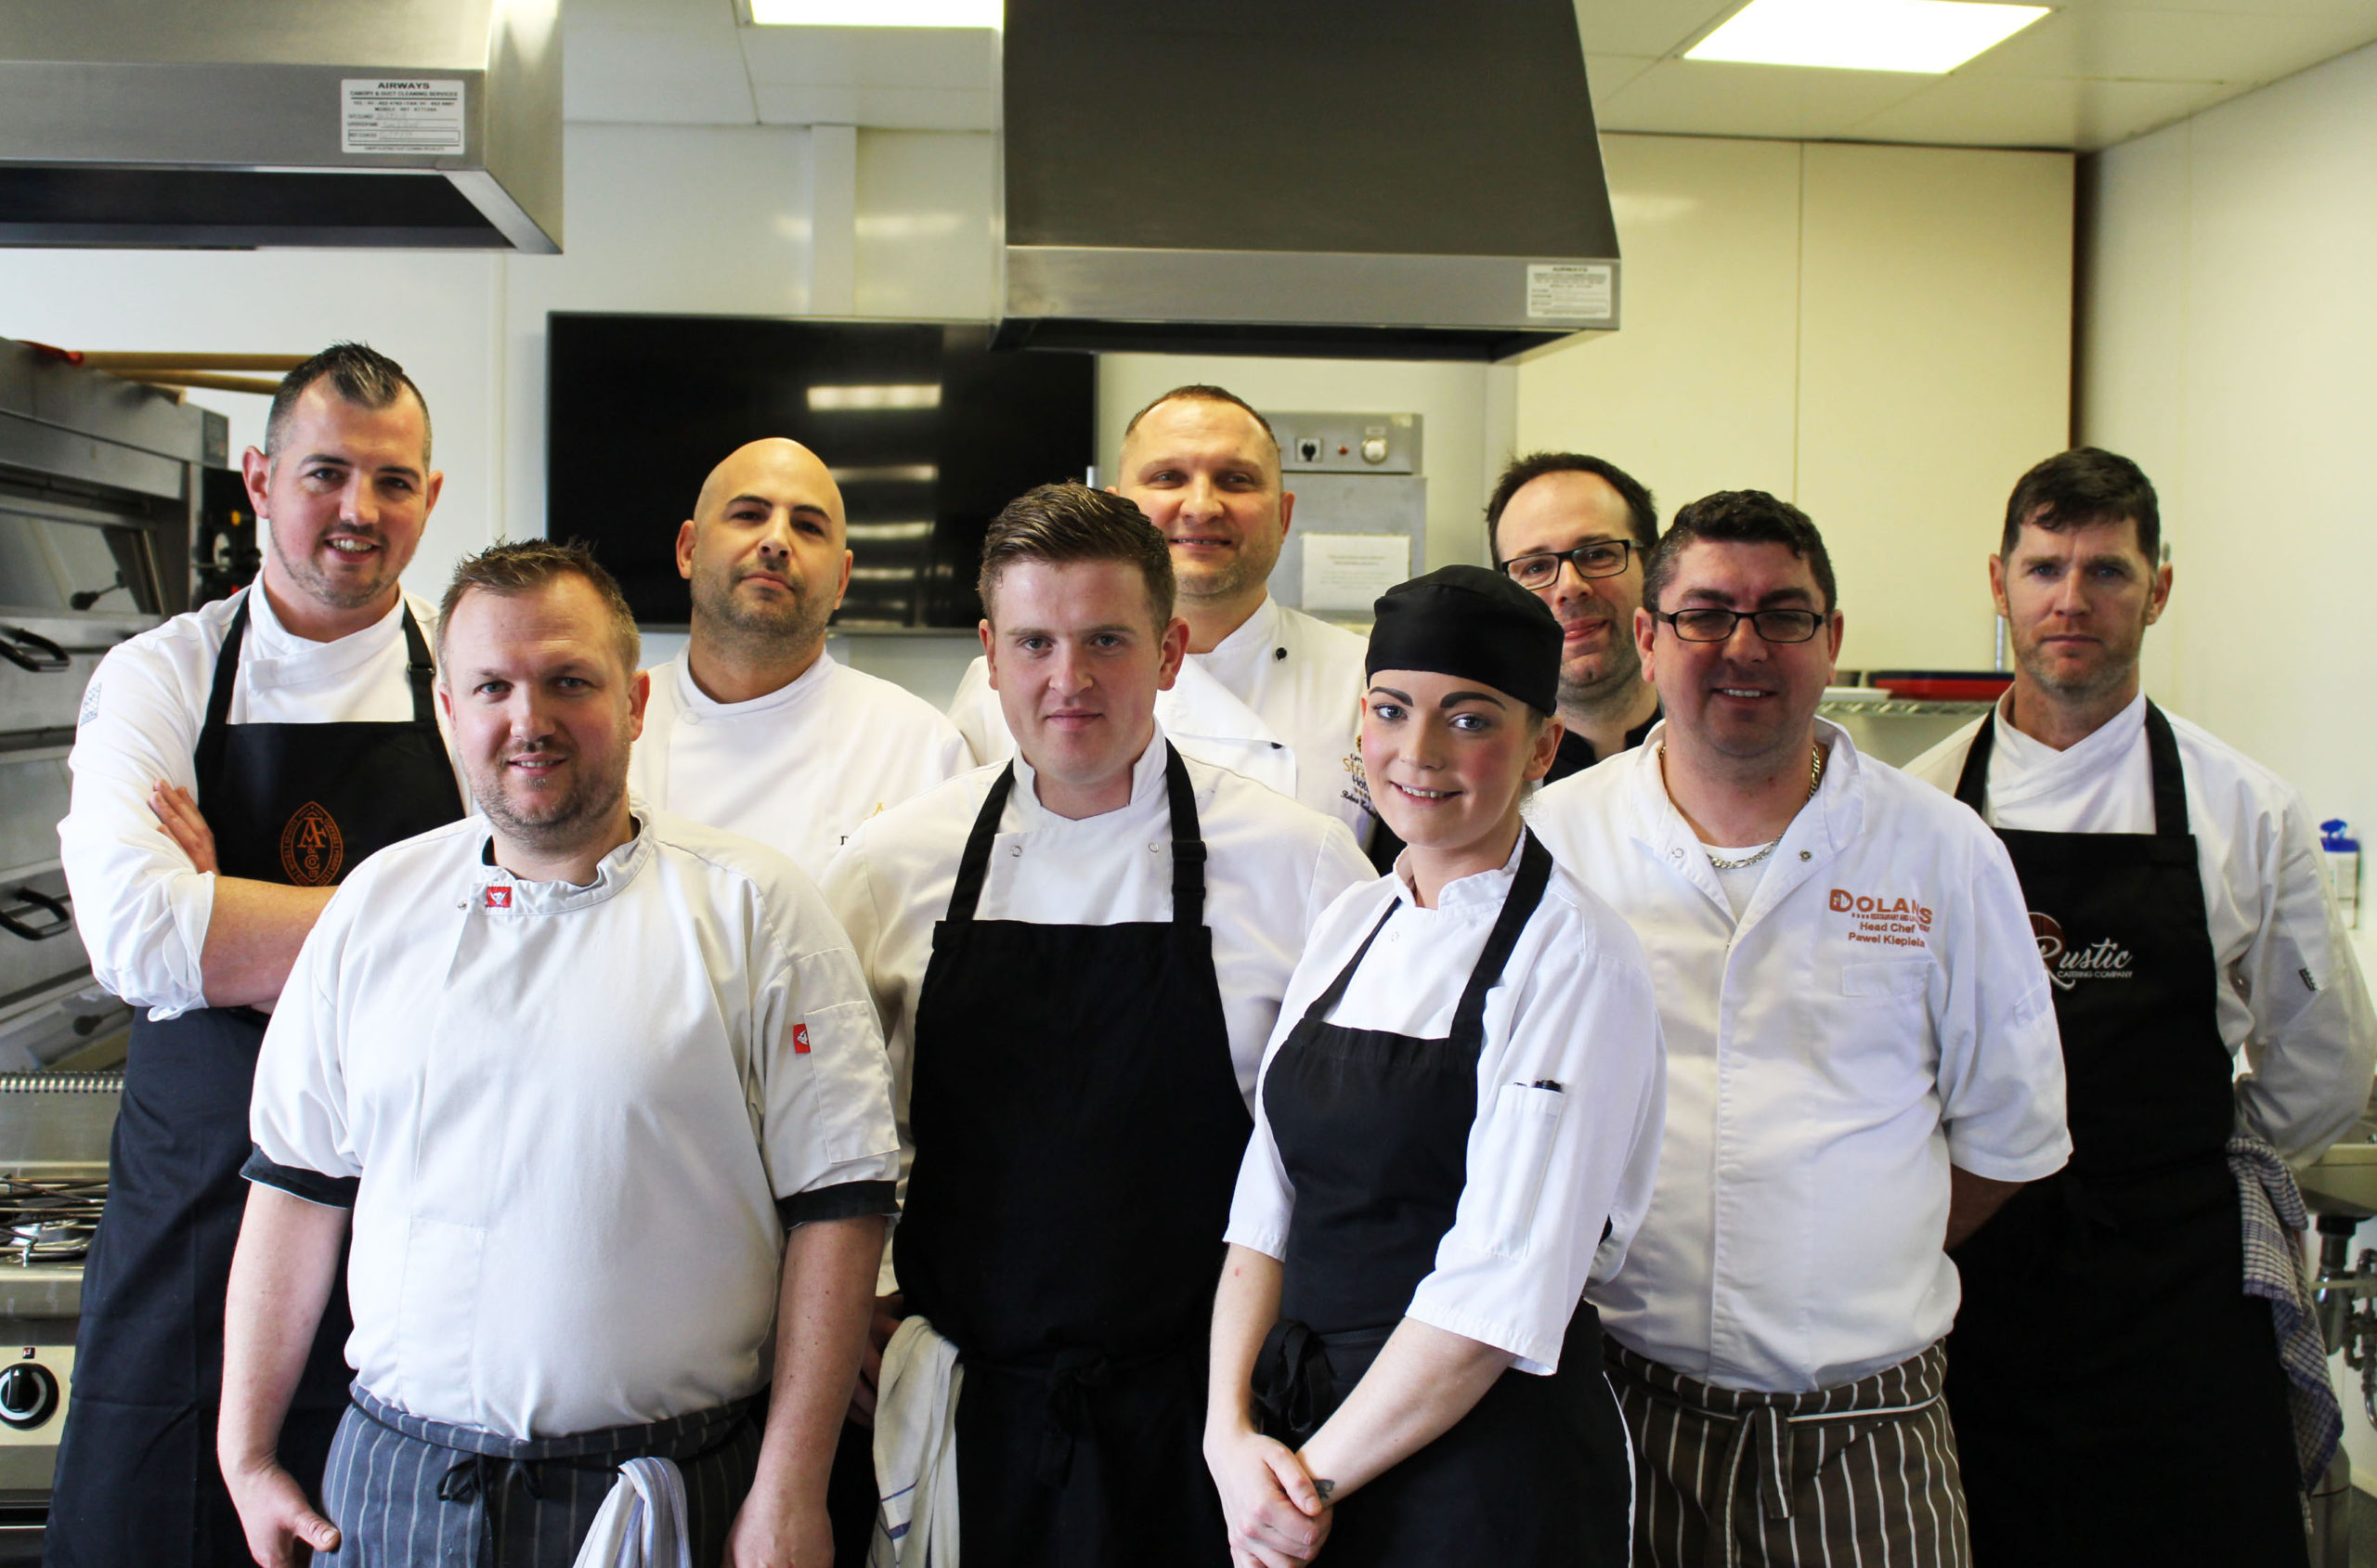 Limerick Chowder Cook-Off 2020